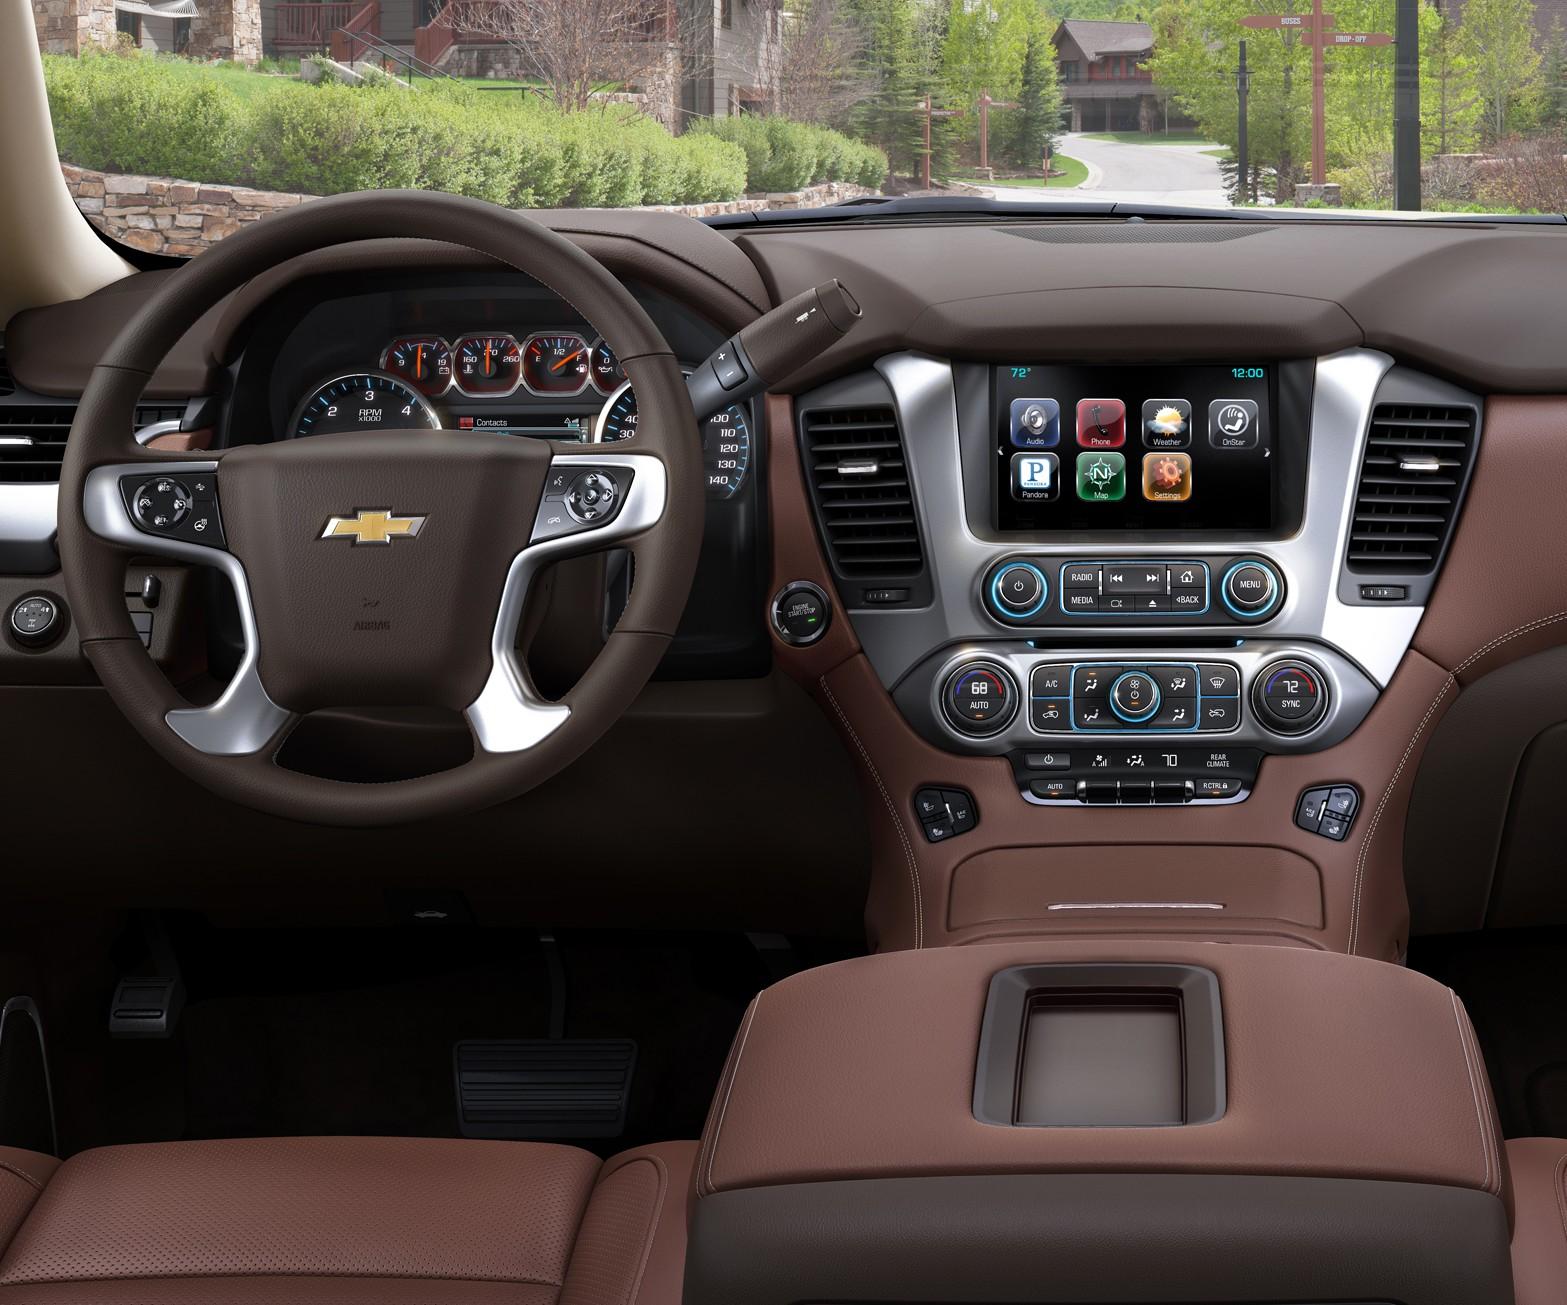 Seat Time 2015 Chevrolet Suburban John S Journal On